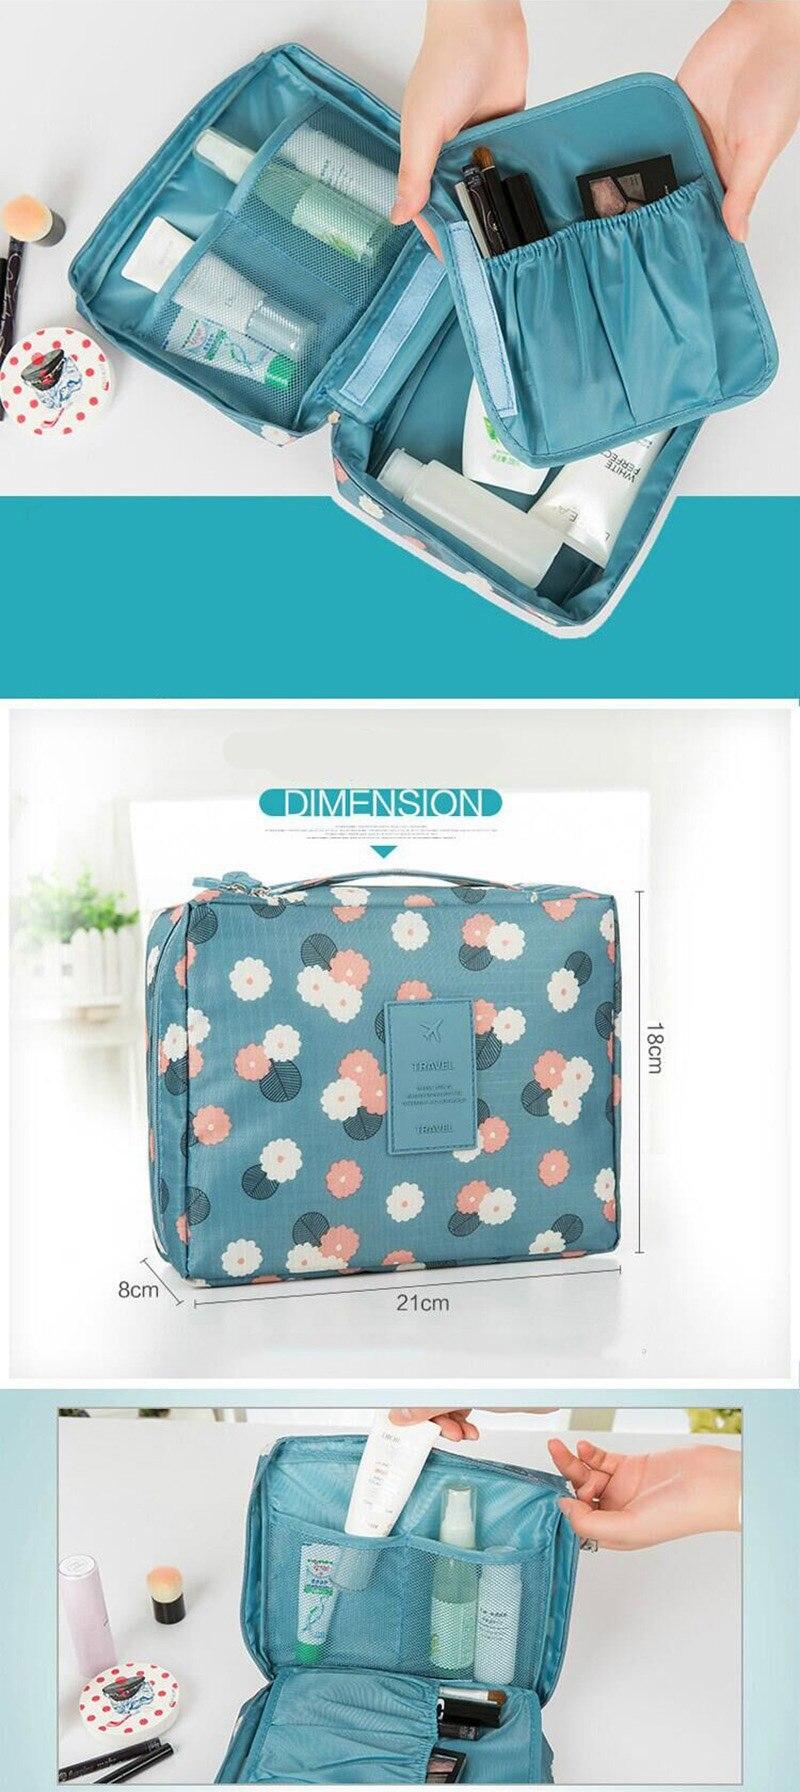 HTB1ba97l4rI8KJjy0Fpq6z5hVXa3 - Fashion Travel Nylon beauty makeup bags water-proof cosmetics bags